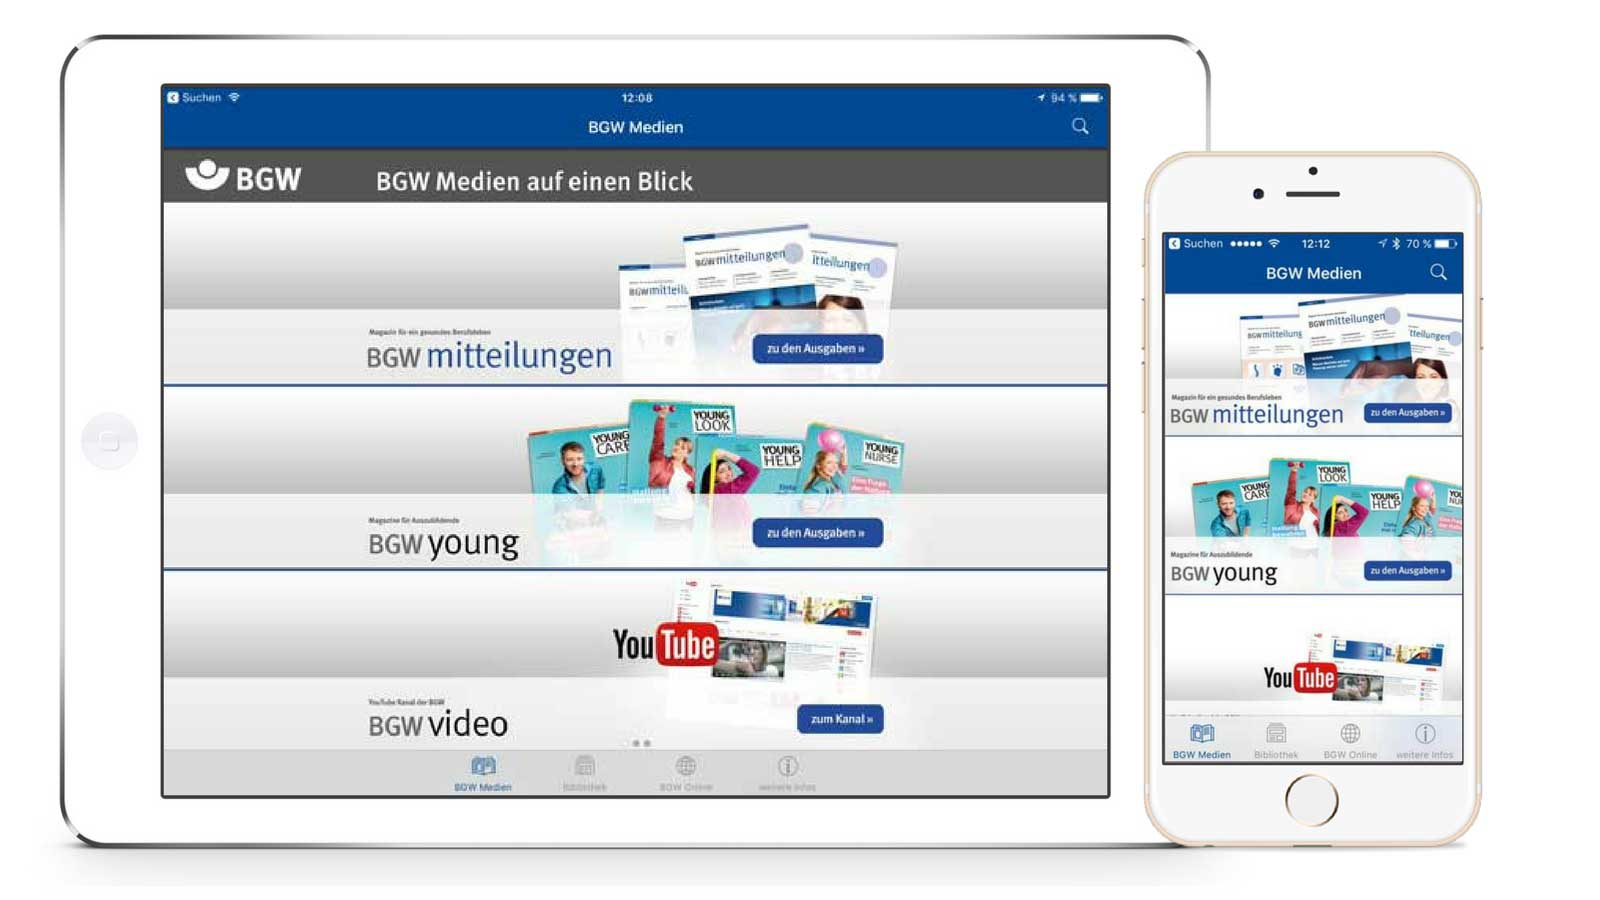 BGW Medien – Interaktive Magazin-App